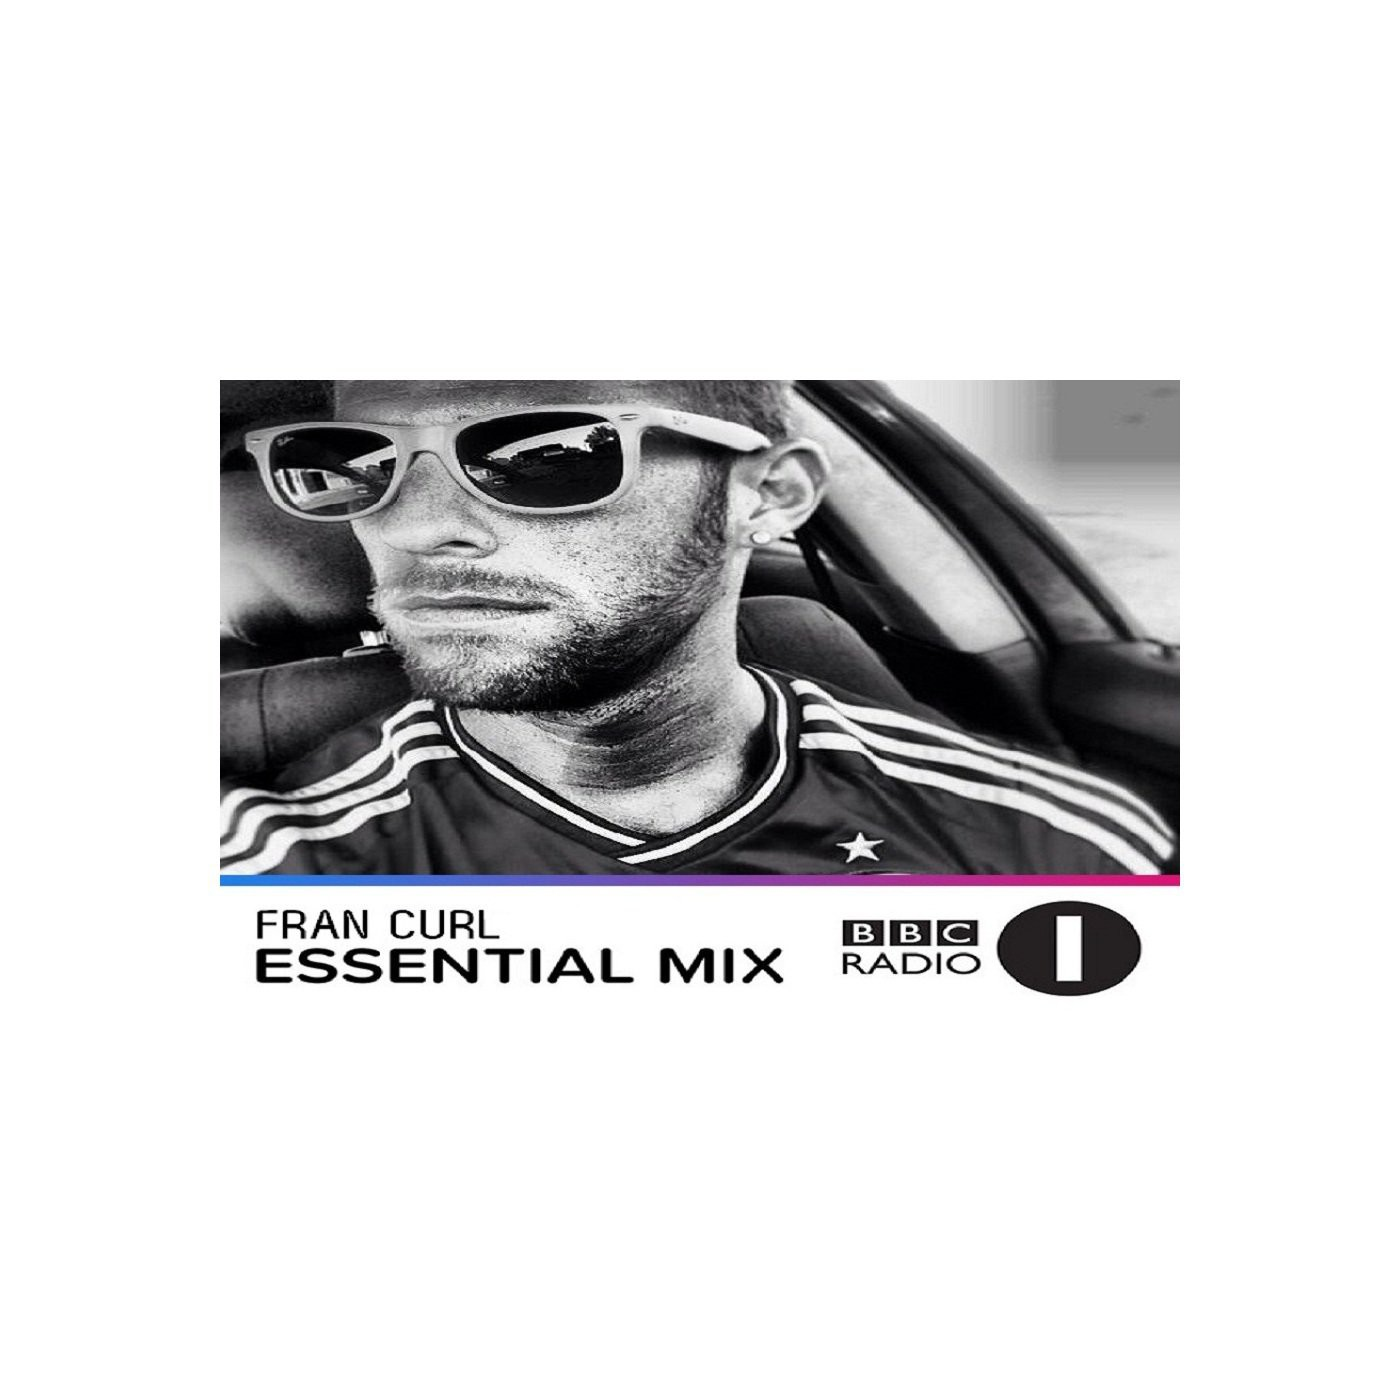 <![CDATA[FRAN CURL BBC RADIO 1 ESSENTIAL MIX]]>